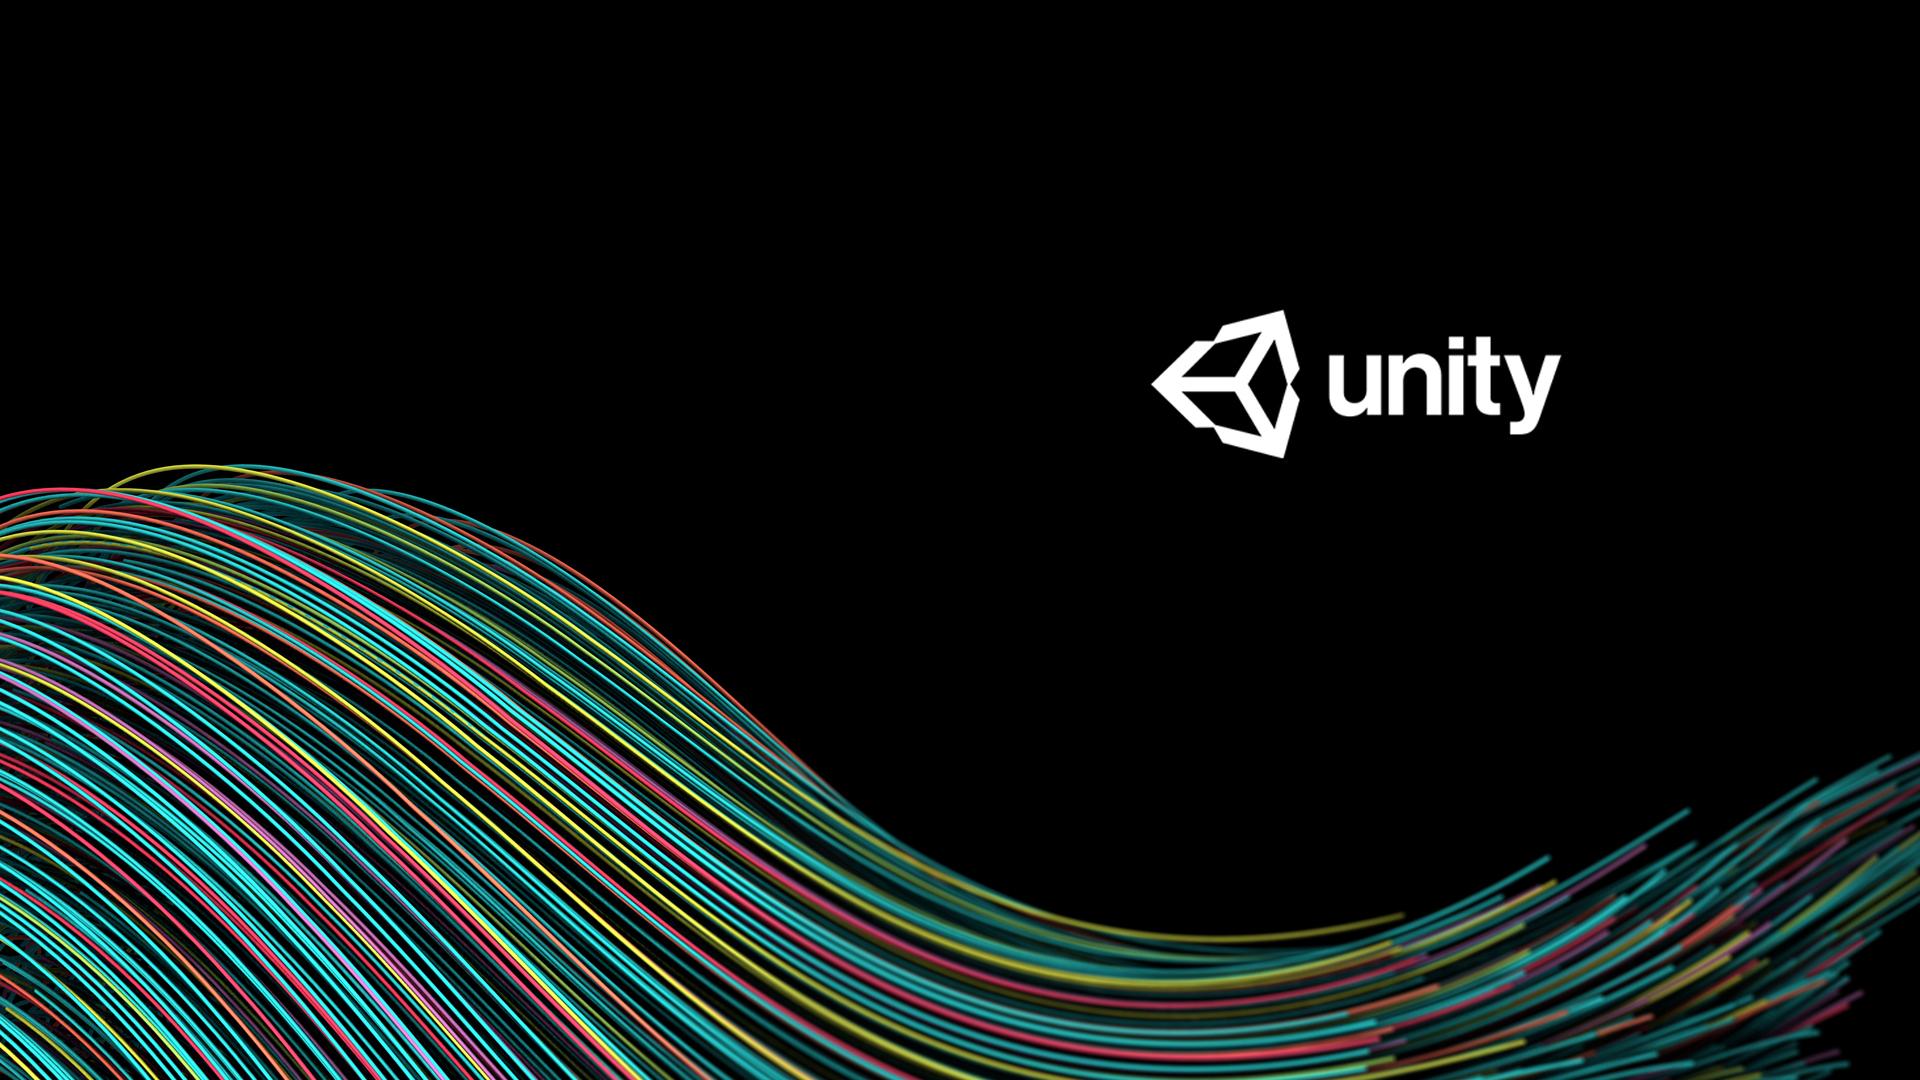 Unity实现尼尔机械纪元运镜设计